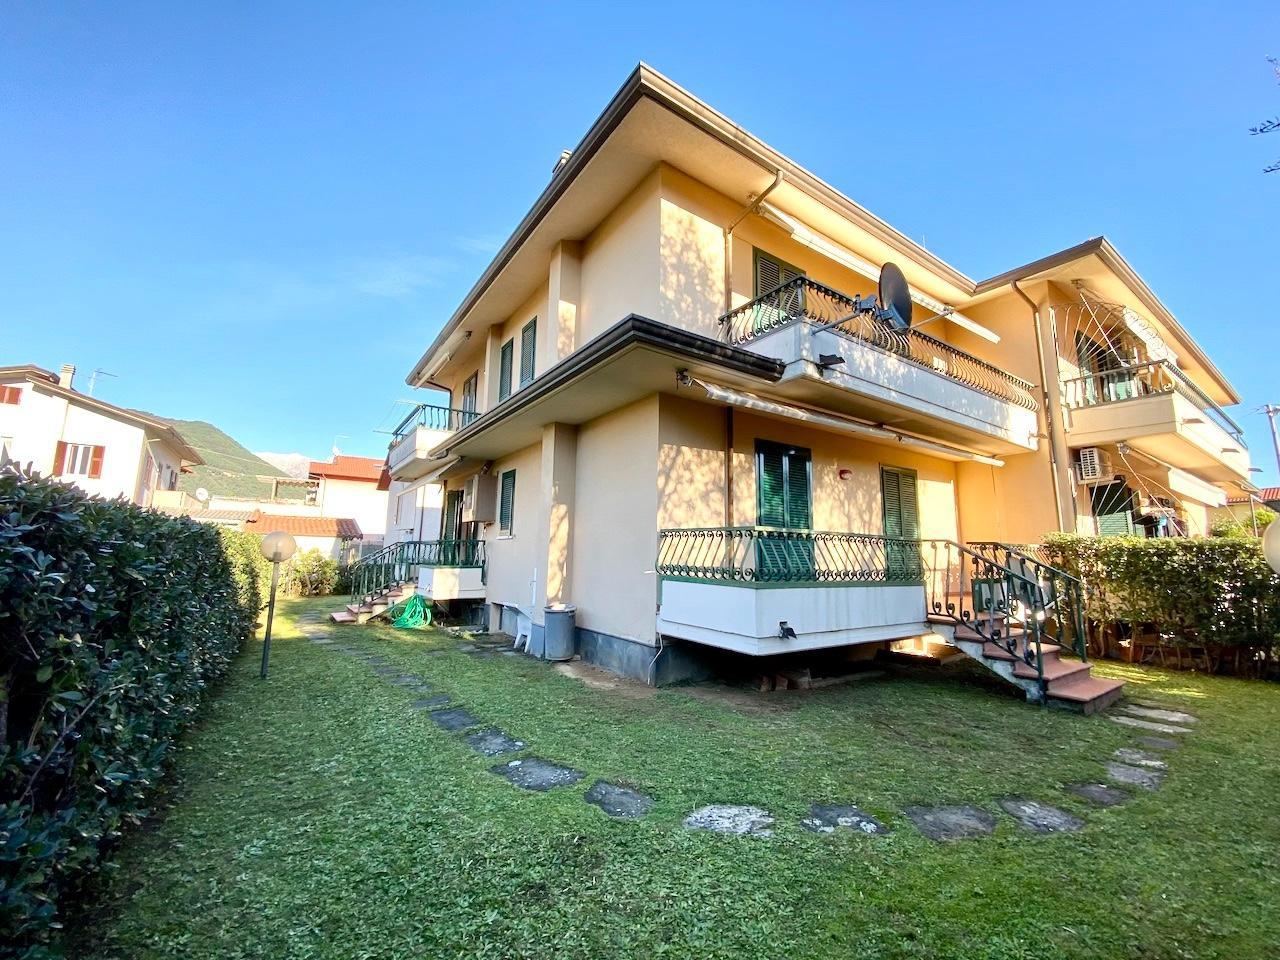 Villetta quadrifamiliare in vendita, rif. LOG-523